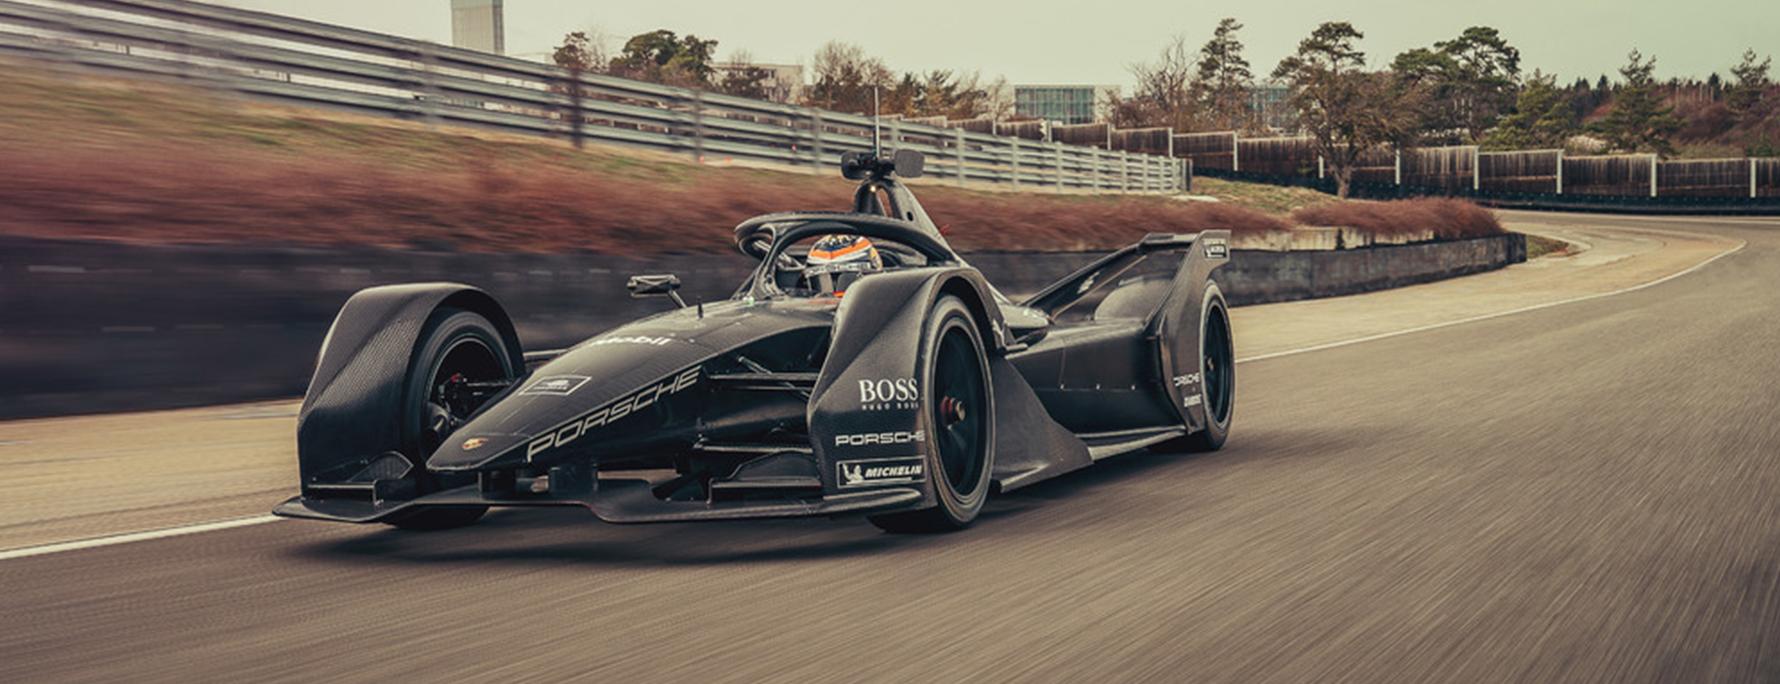 Rahmenprogramm Porsche Tennis Grand Prix 2019